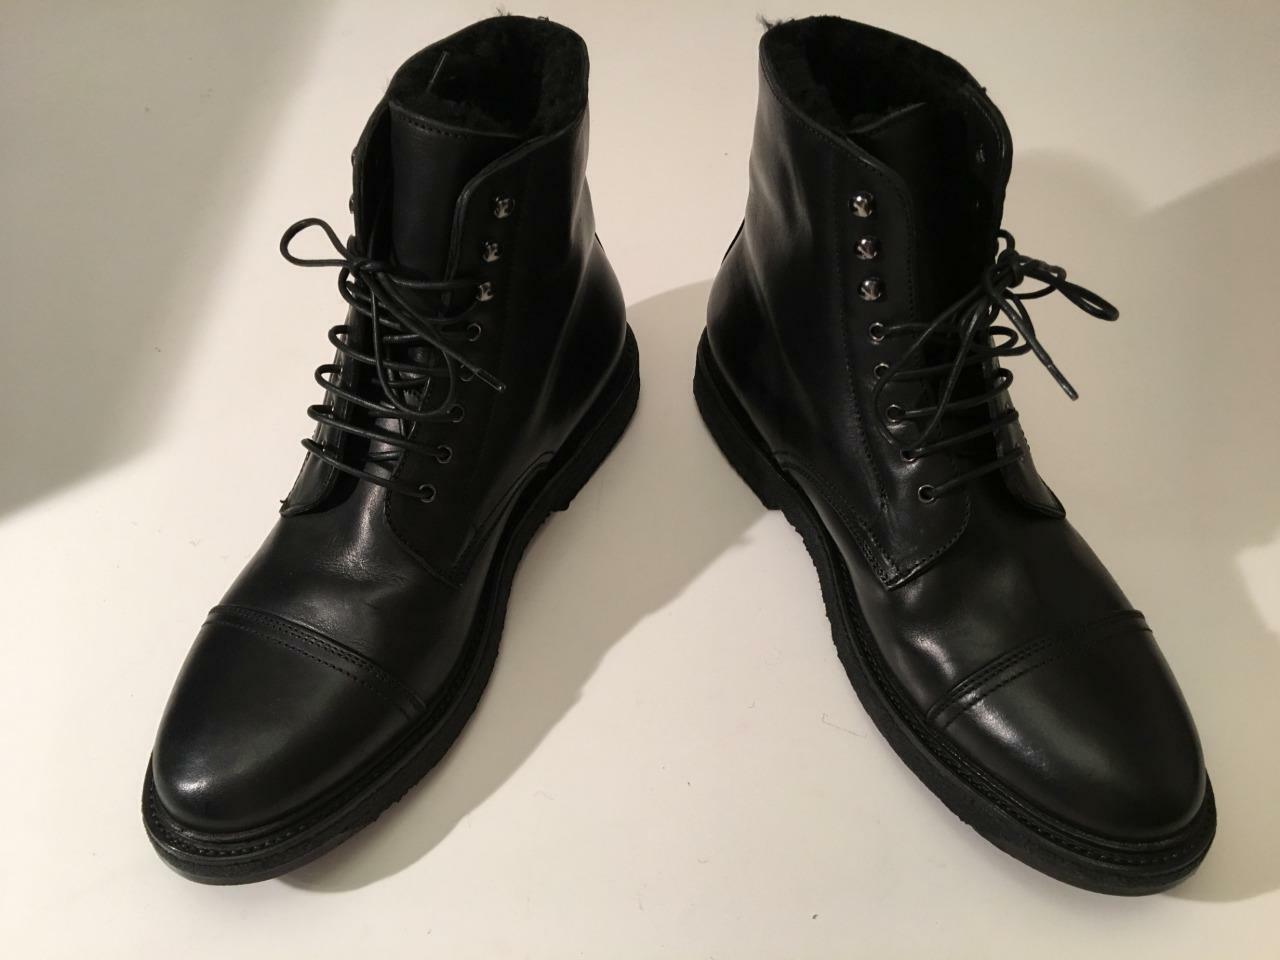 Nuevo en Caja Auth RALPH LAUREN Trystan vachetta Negro de Cuero de Piel de Oveja Piel botas 10D